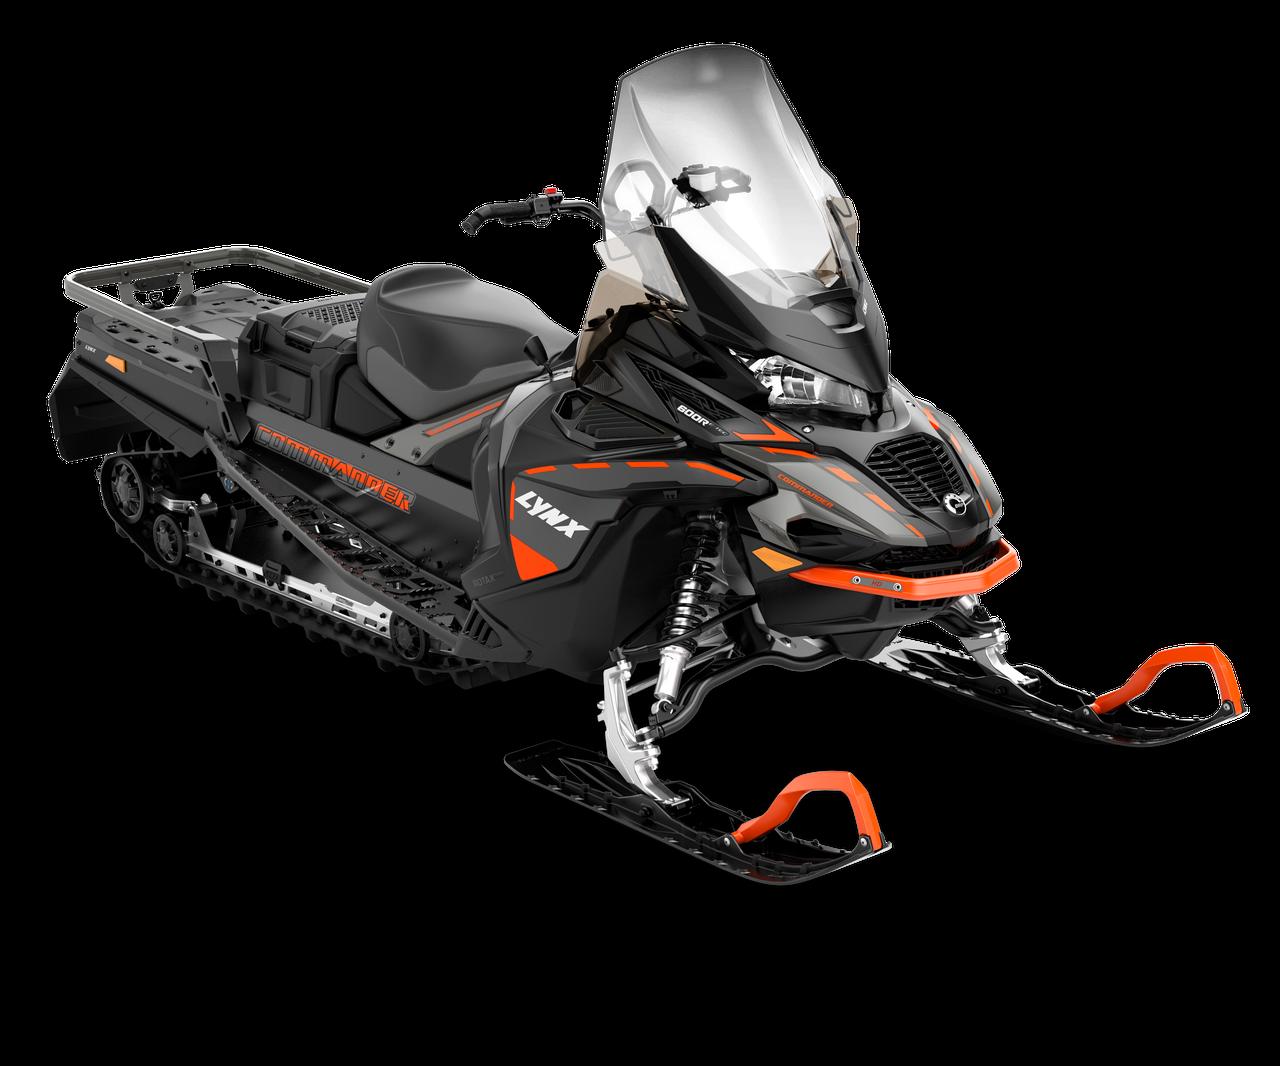 Снегоход Commander Studded track 38 mm 900 ACE Черно-серый 2021